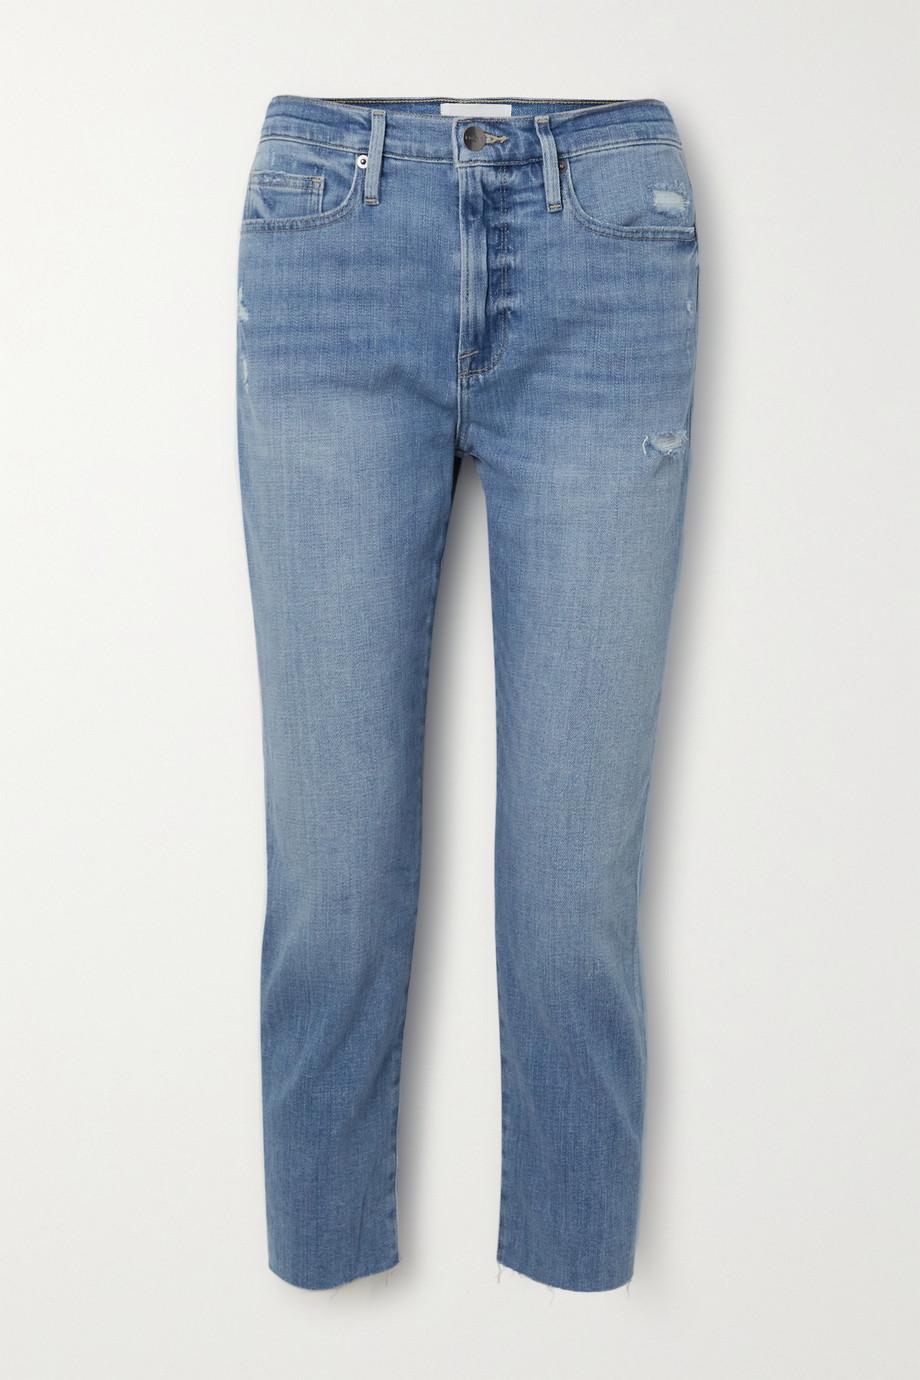 FRAME Le Beau cropped distressed boyfriend jeans